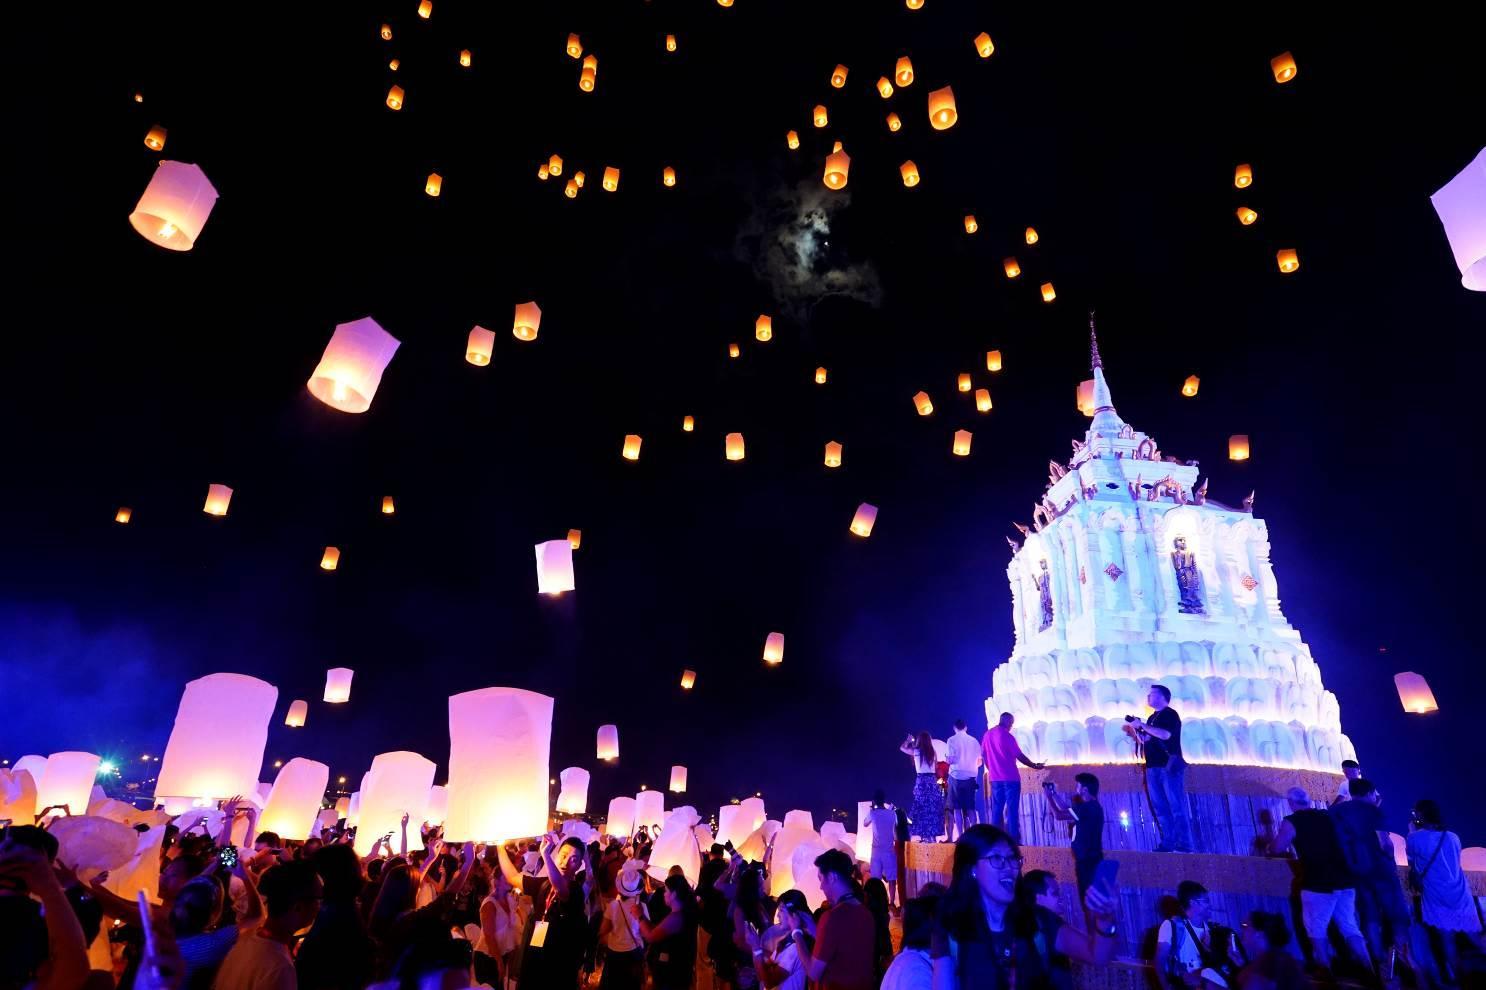 ki niem kho quen loy krathong festival 2018 le hoi den troi chiang mai17